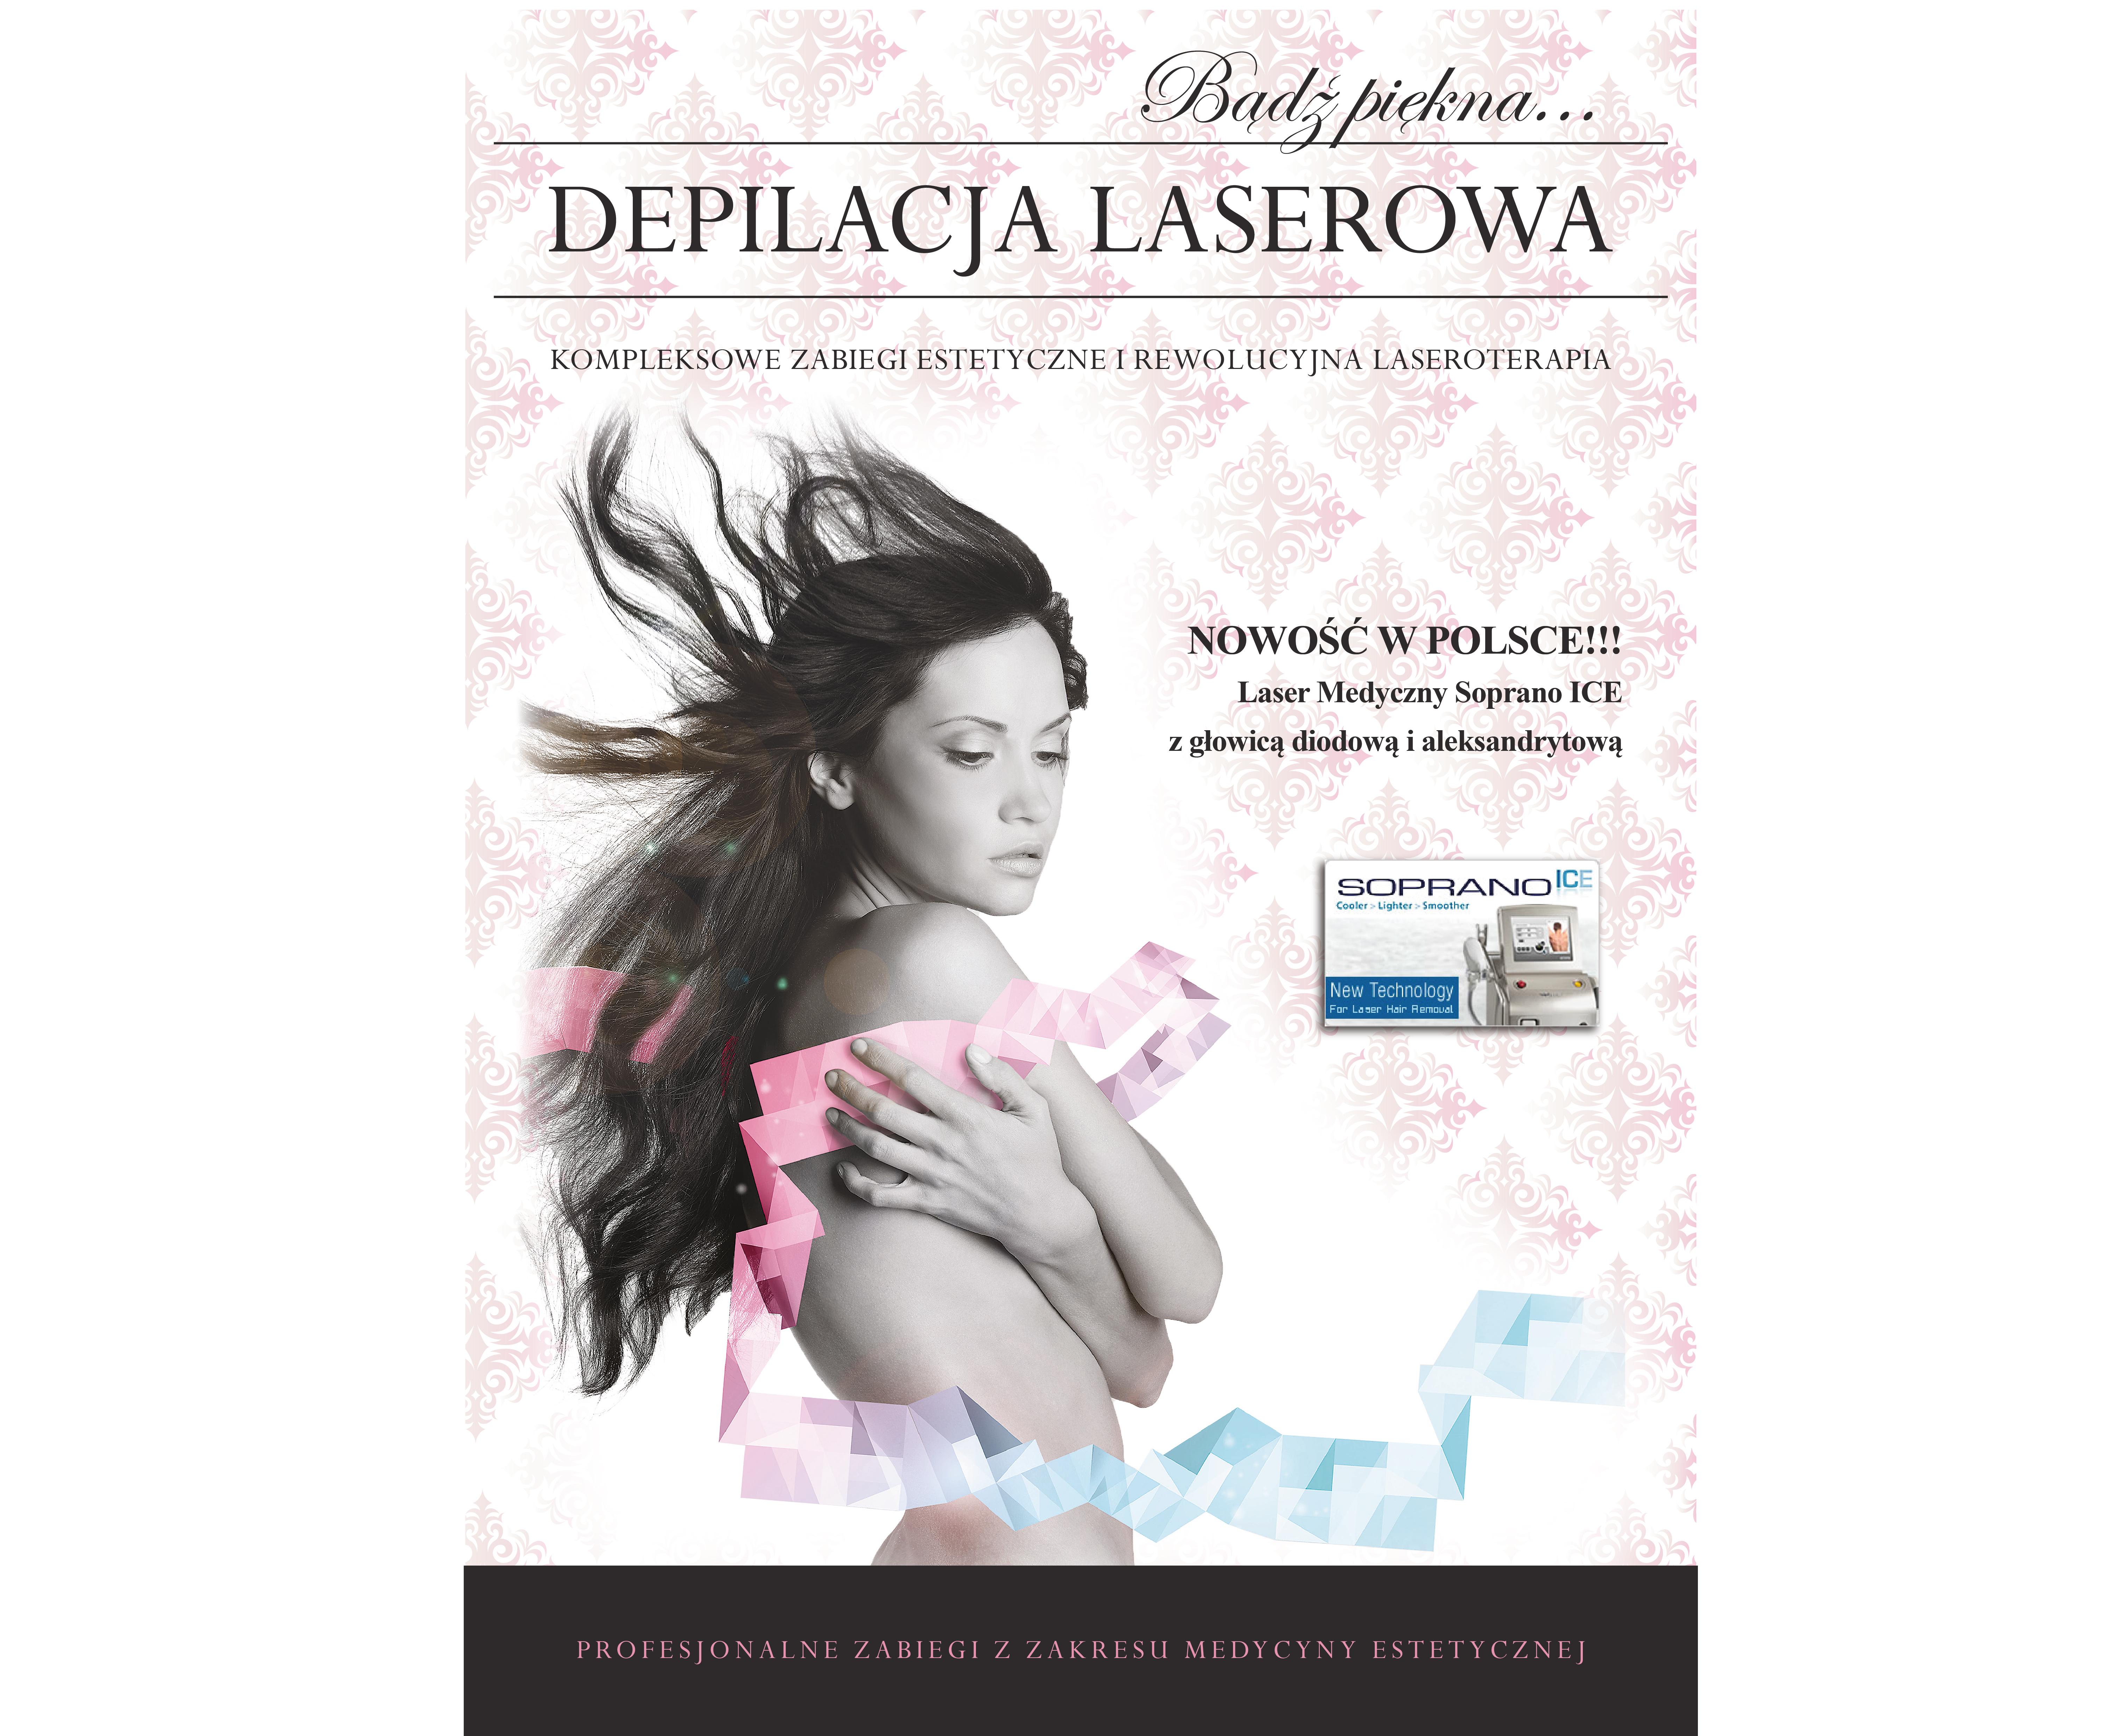 depilacja-laserowa-a3